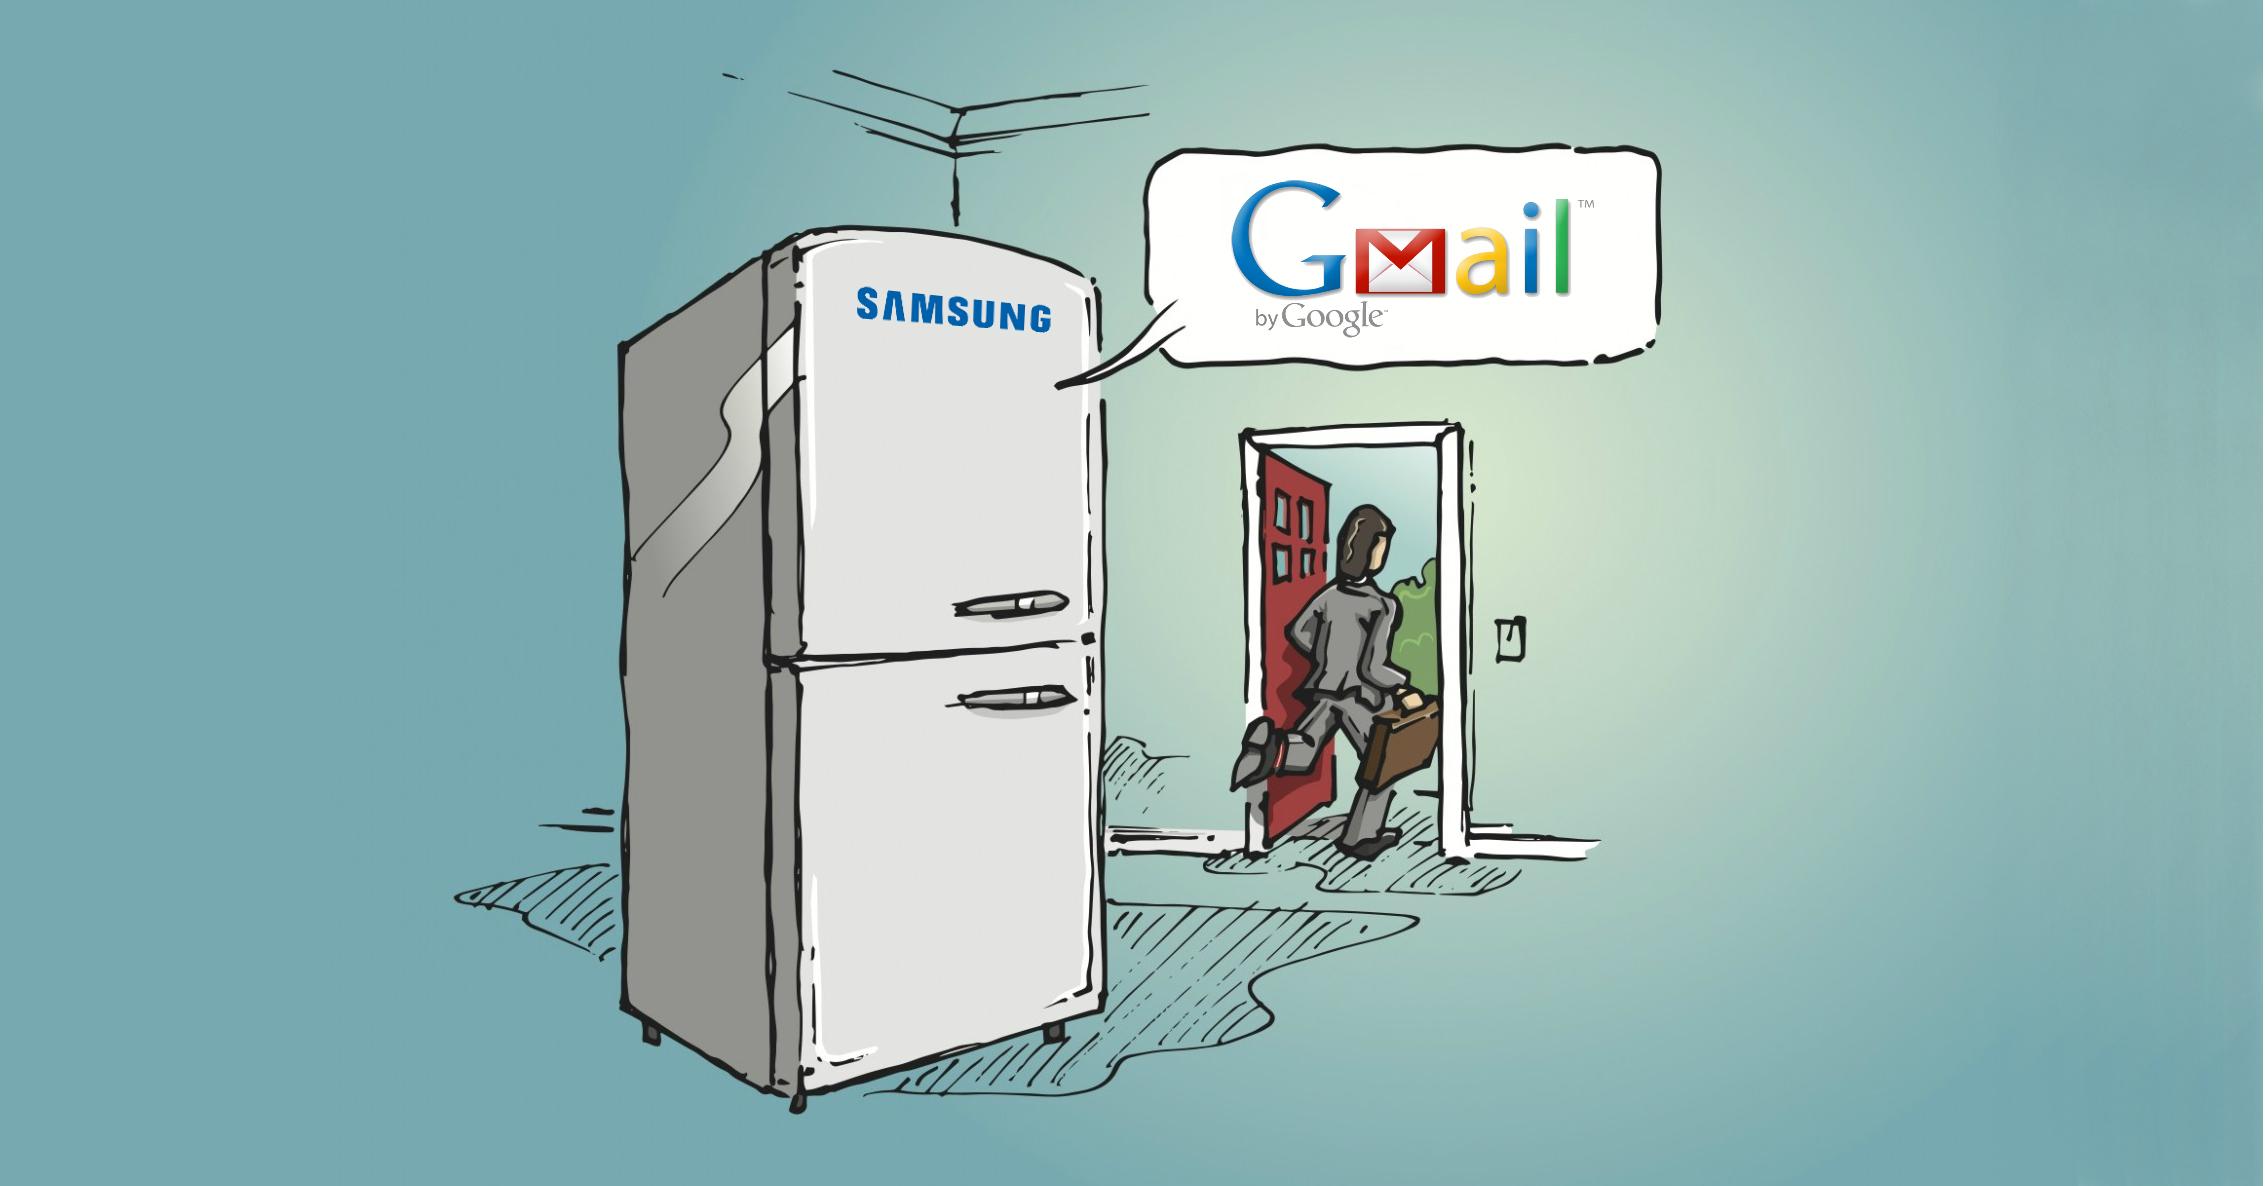 frigoriferi samsung rubano account gmail